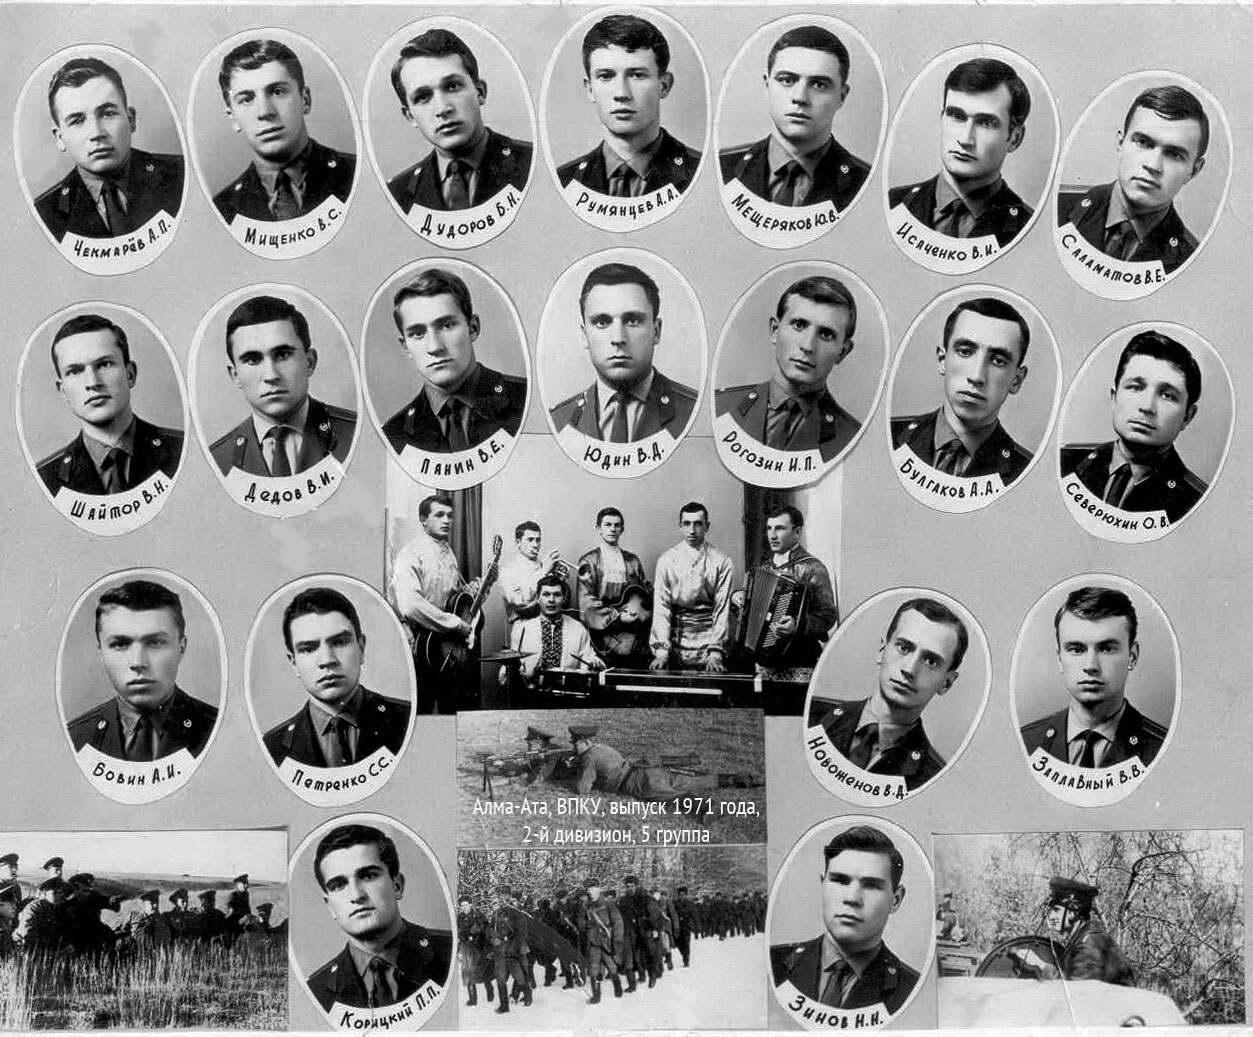 http://sevolvas.narod.ru/05.jpg